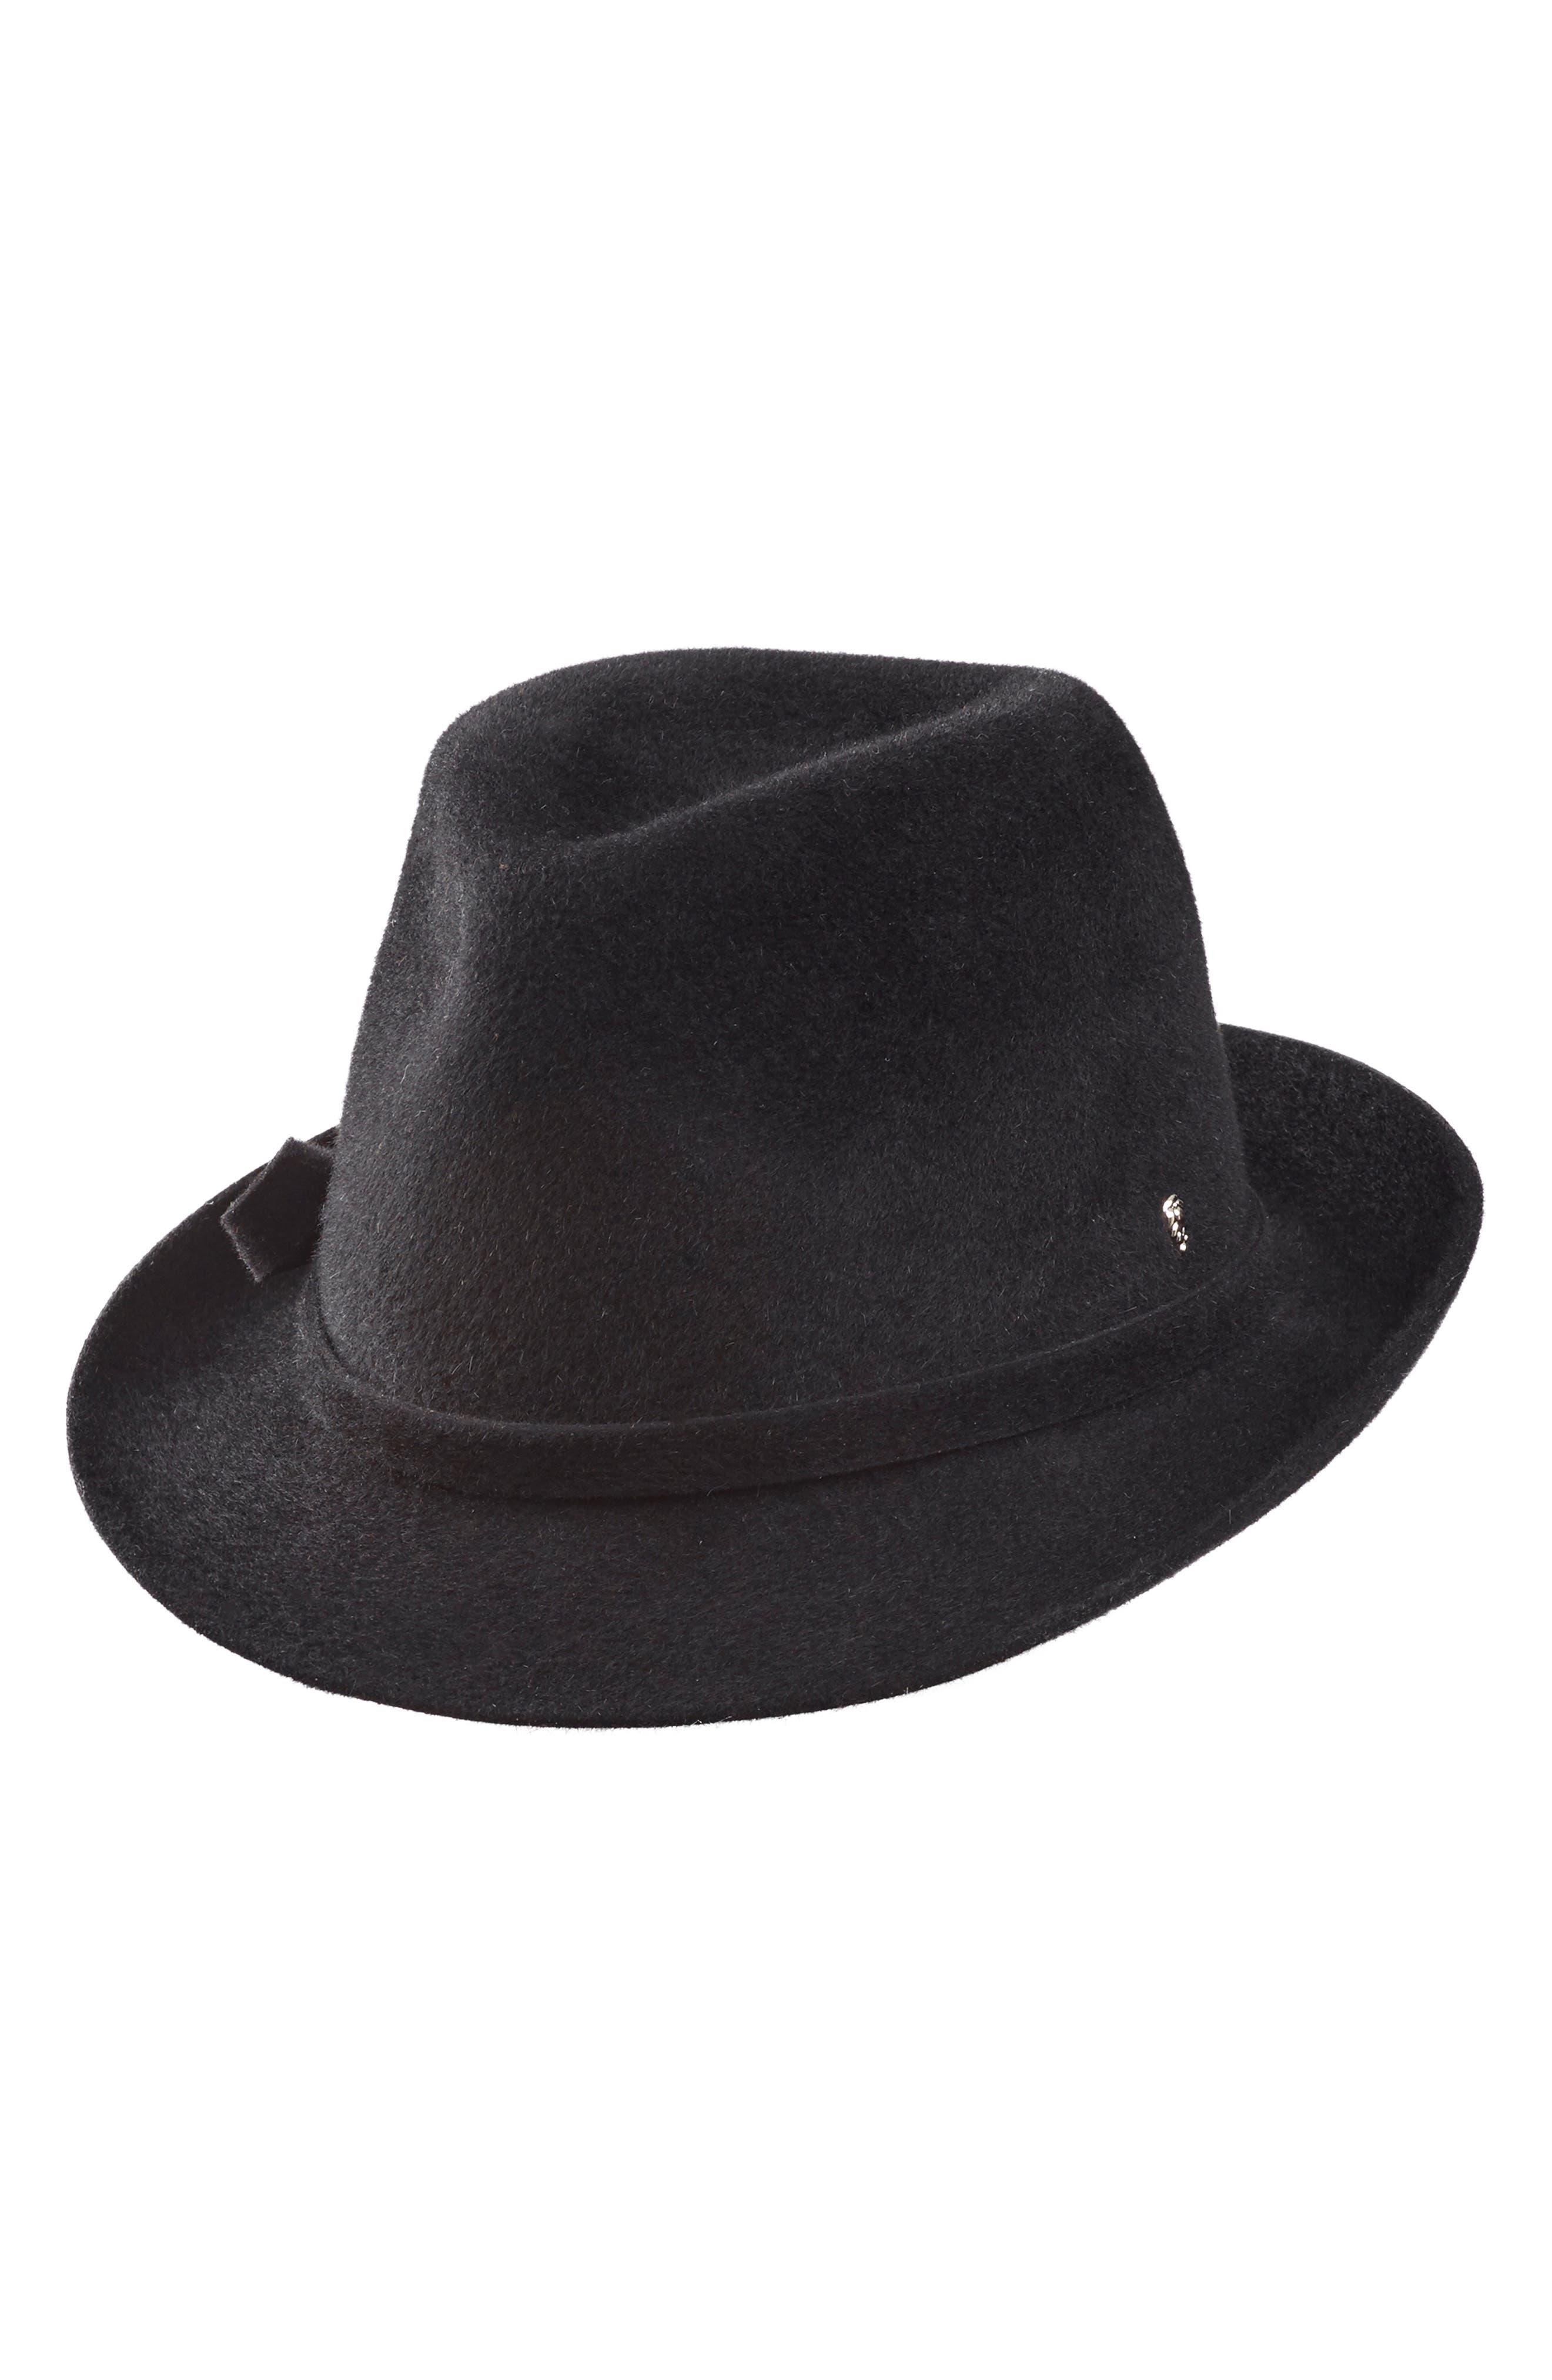 HELEN KAMINSKI Fur Felt Fedora, Main, color, BLACK